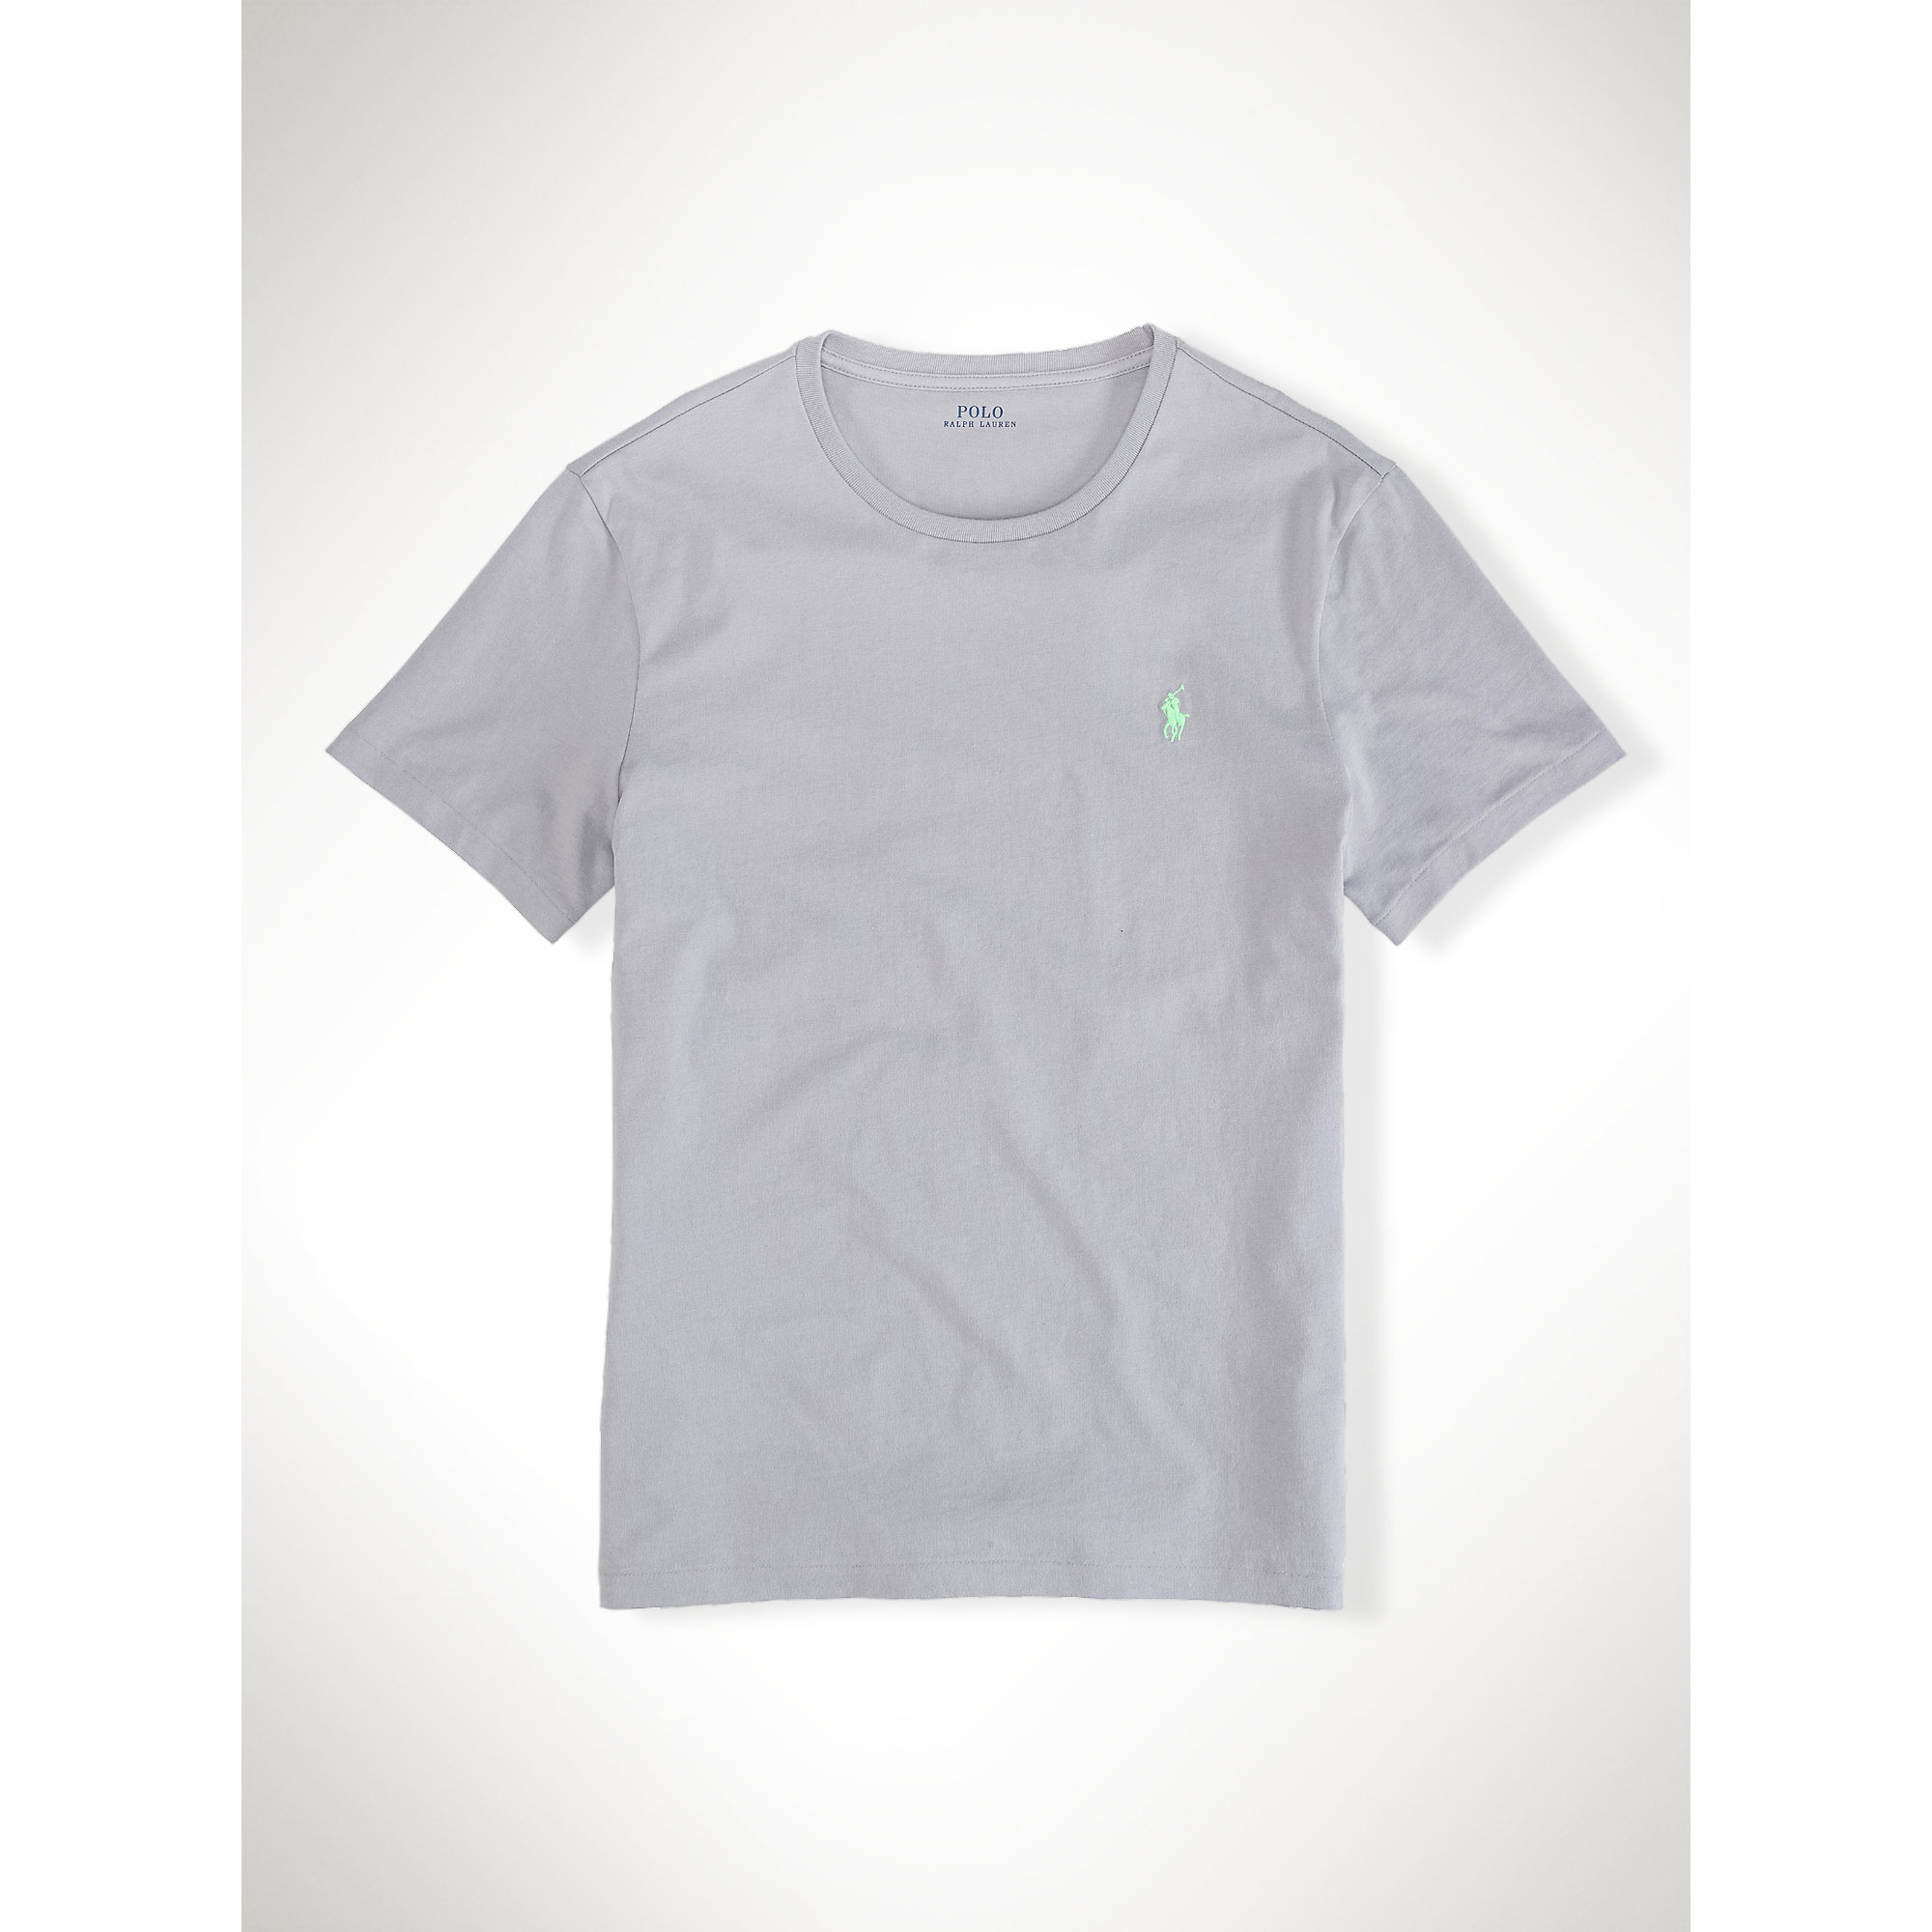 Polo ralph lauren custom fit jersey t shirt in gray for for Polo custom fit t shirts